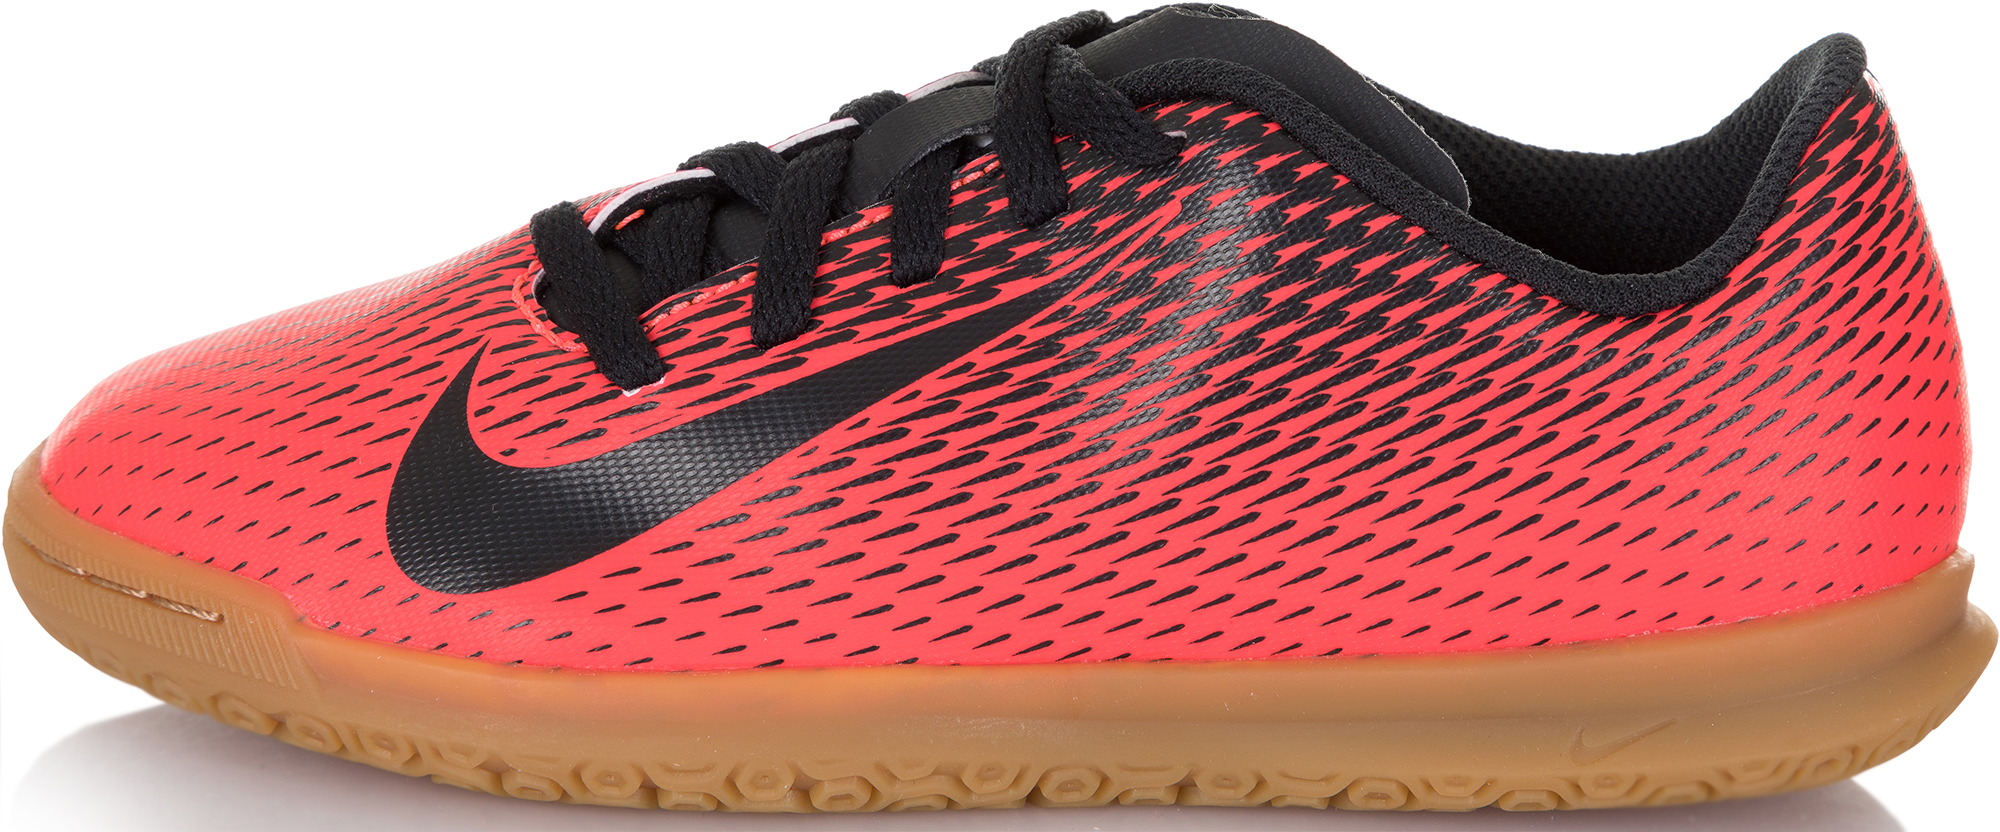 Nike Бутсы для мальчиков Nike Bravatax II IC, размер 31